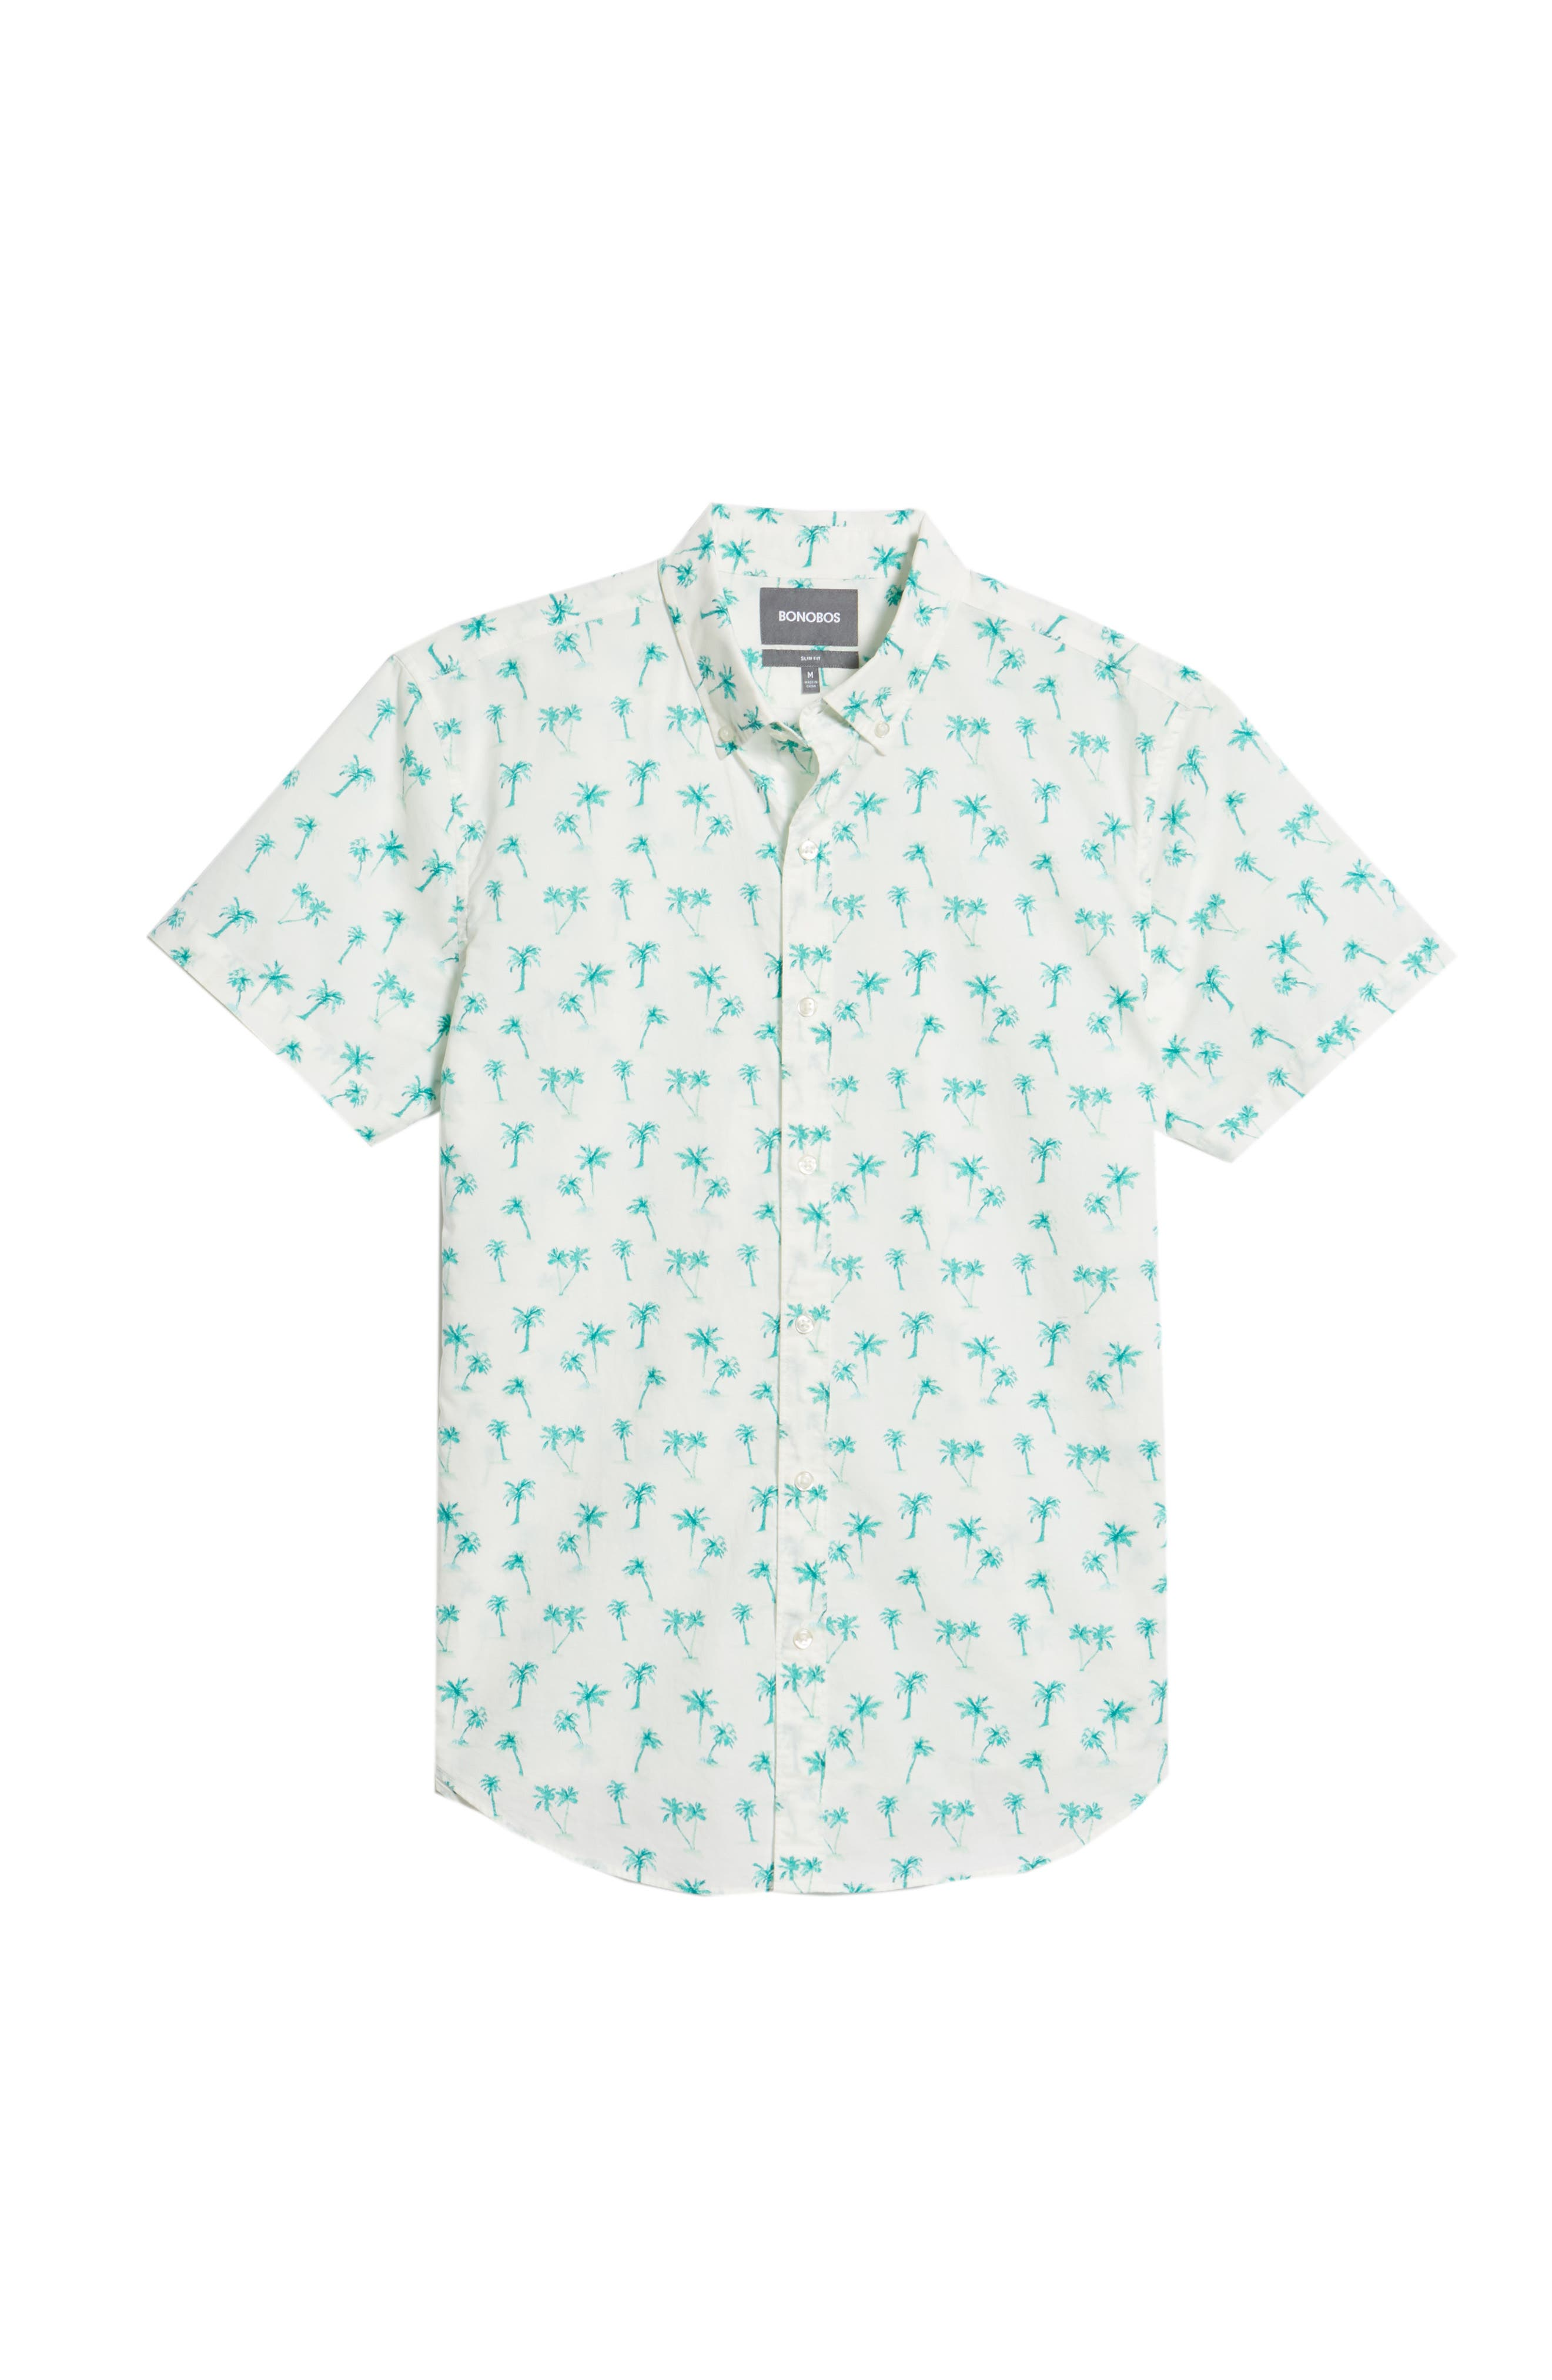 Riviera Slim Fit Palm Print Sport Shirt,                             Alternate thumbnail 6, color,                             Dreamy Palm - Latigo Bay